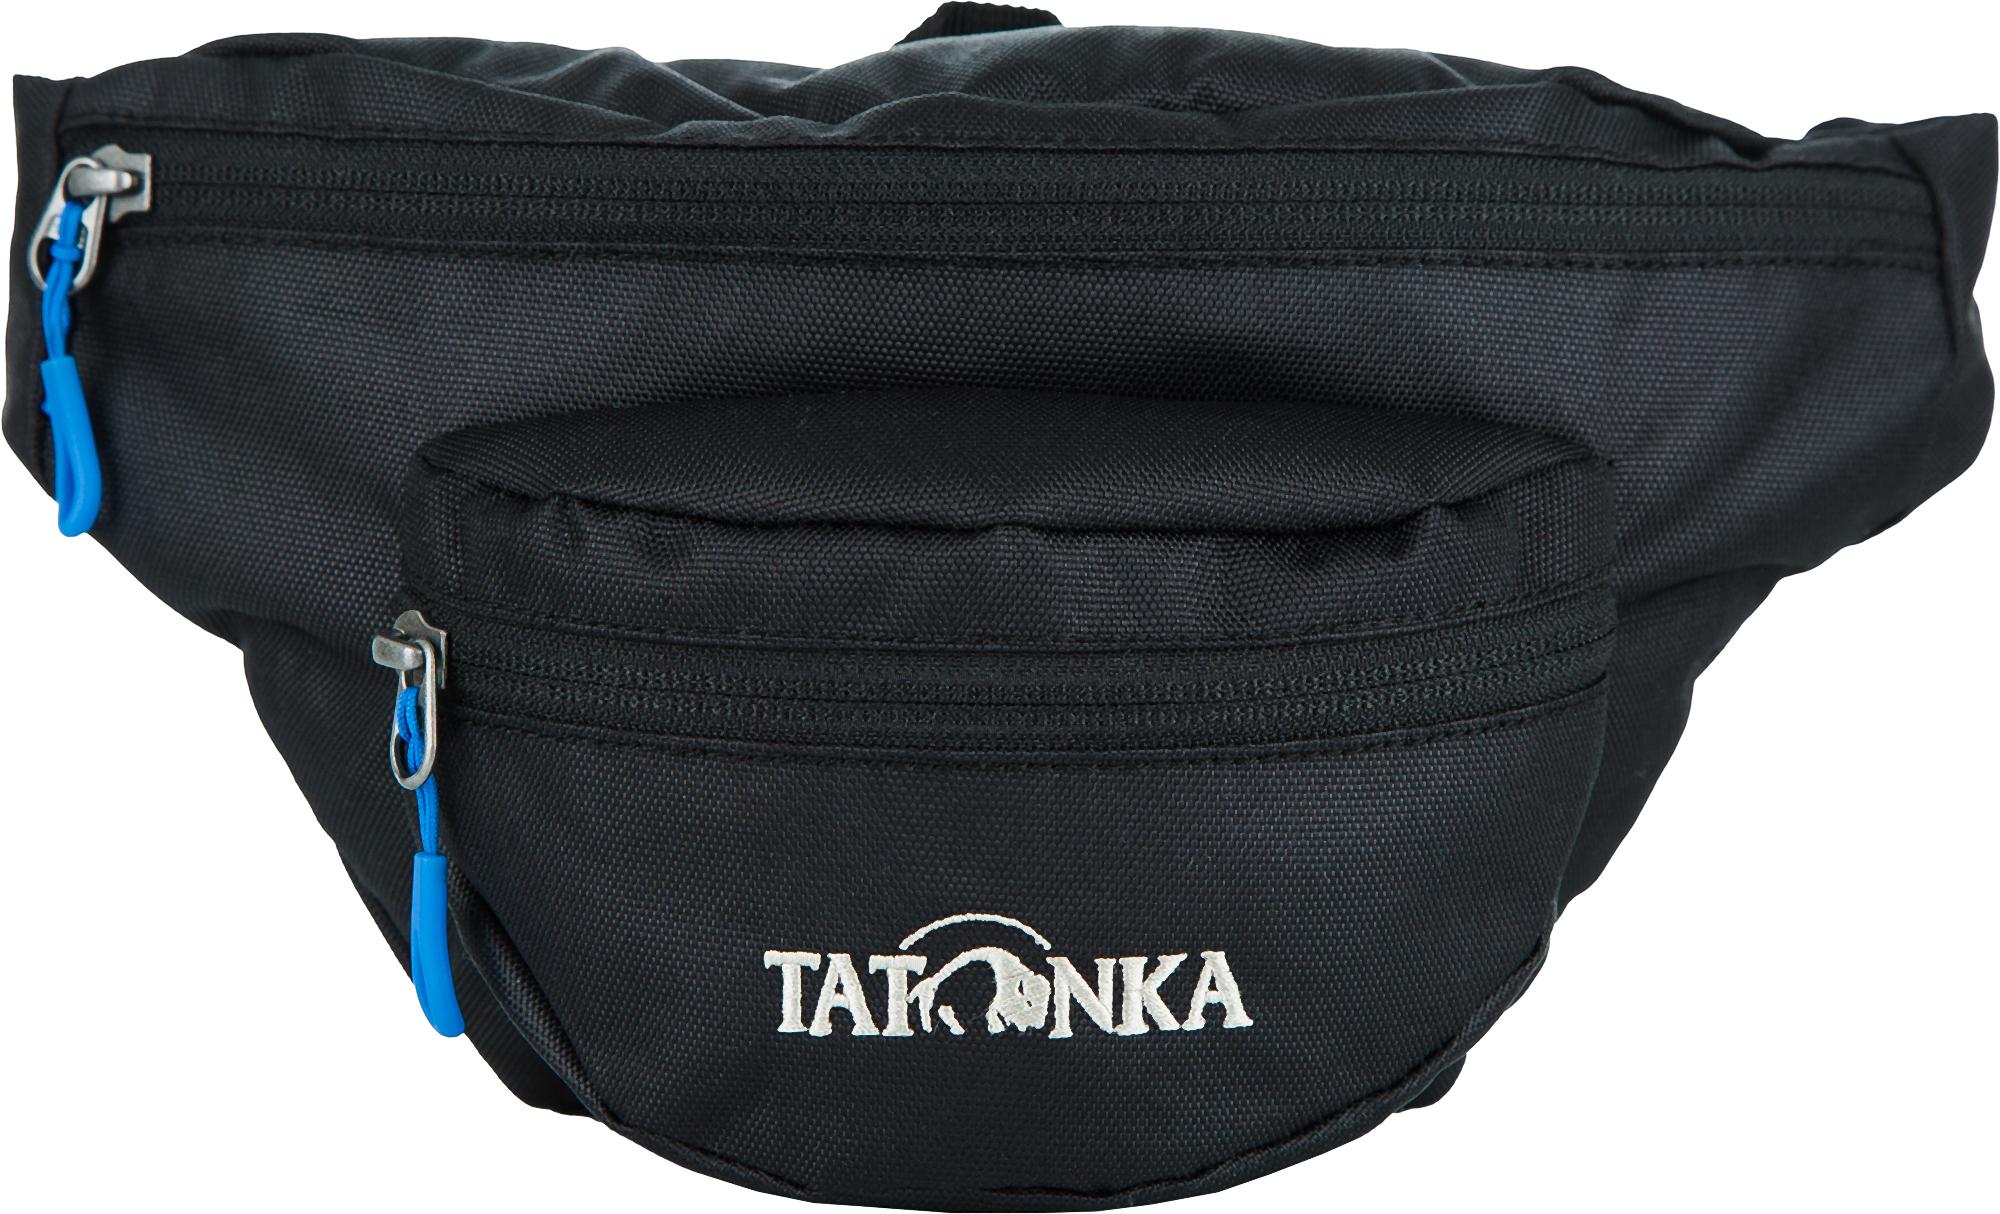 Tatonka Сумка для документов Tatonka FUNNYBAG tatonka косметичка tatonka one week